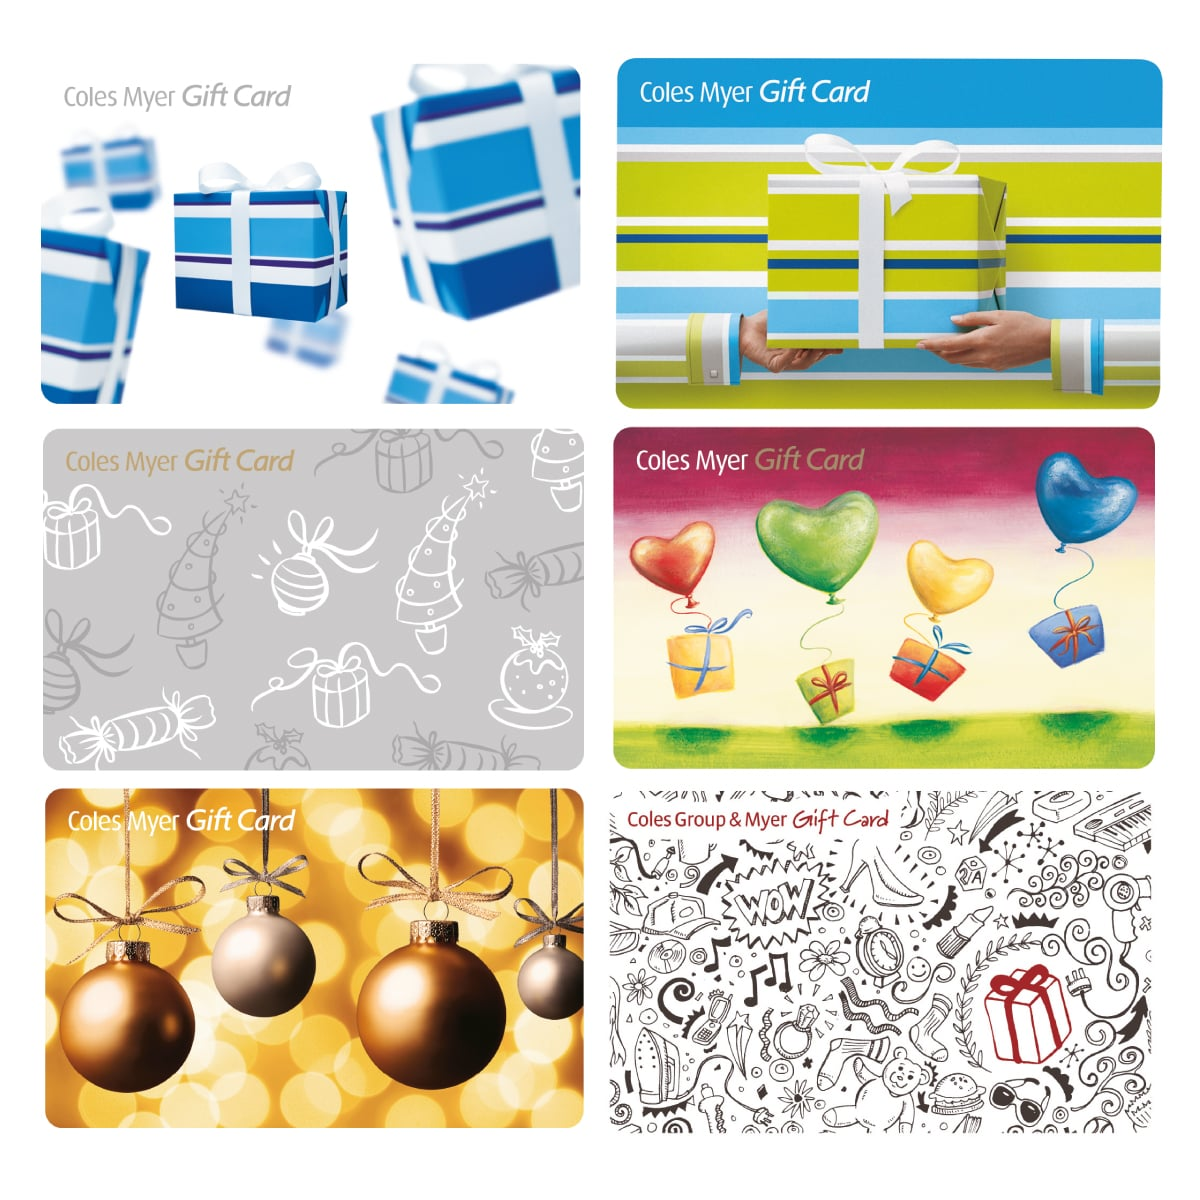 Davidson Branding Retail Coles Myer Gift Card Set